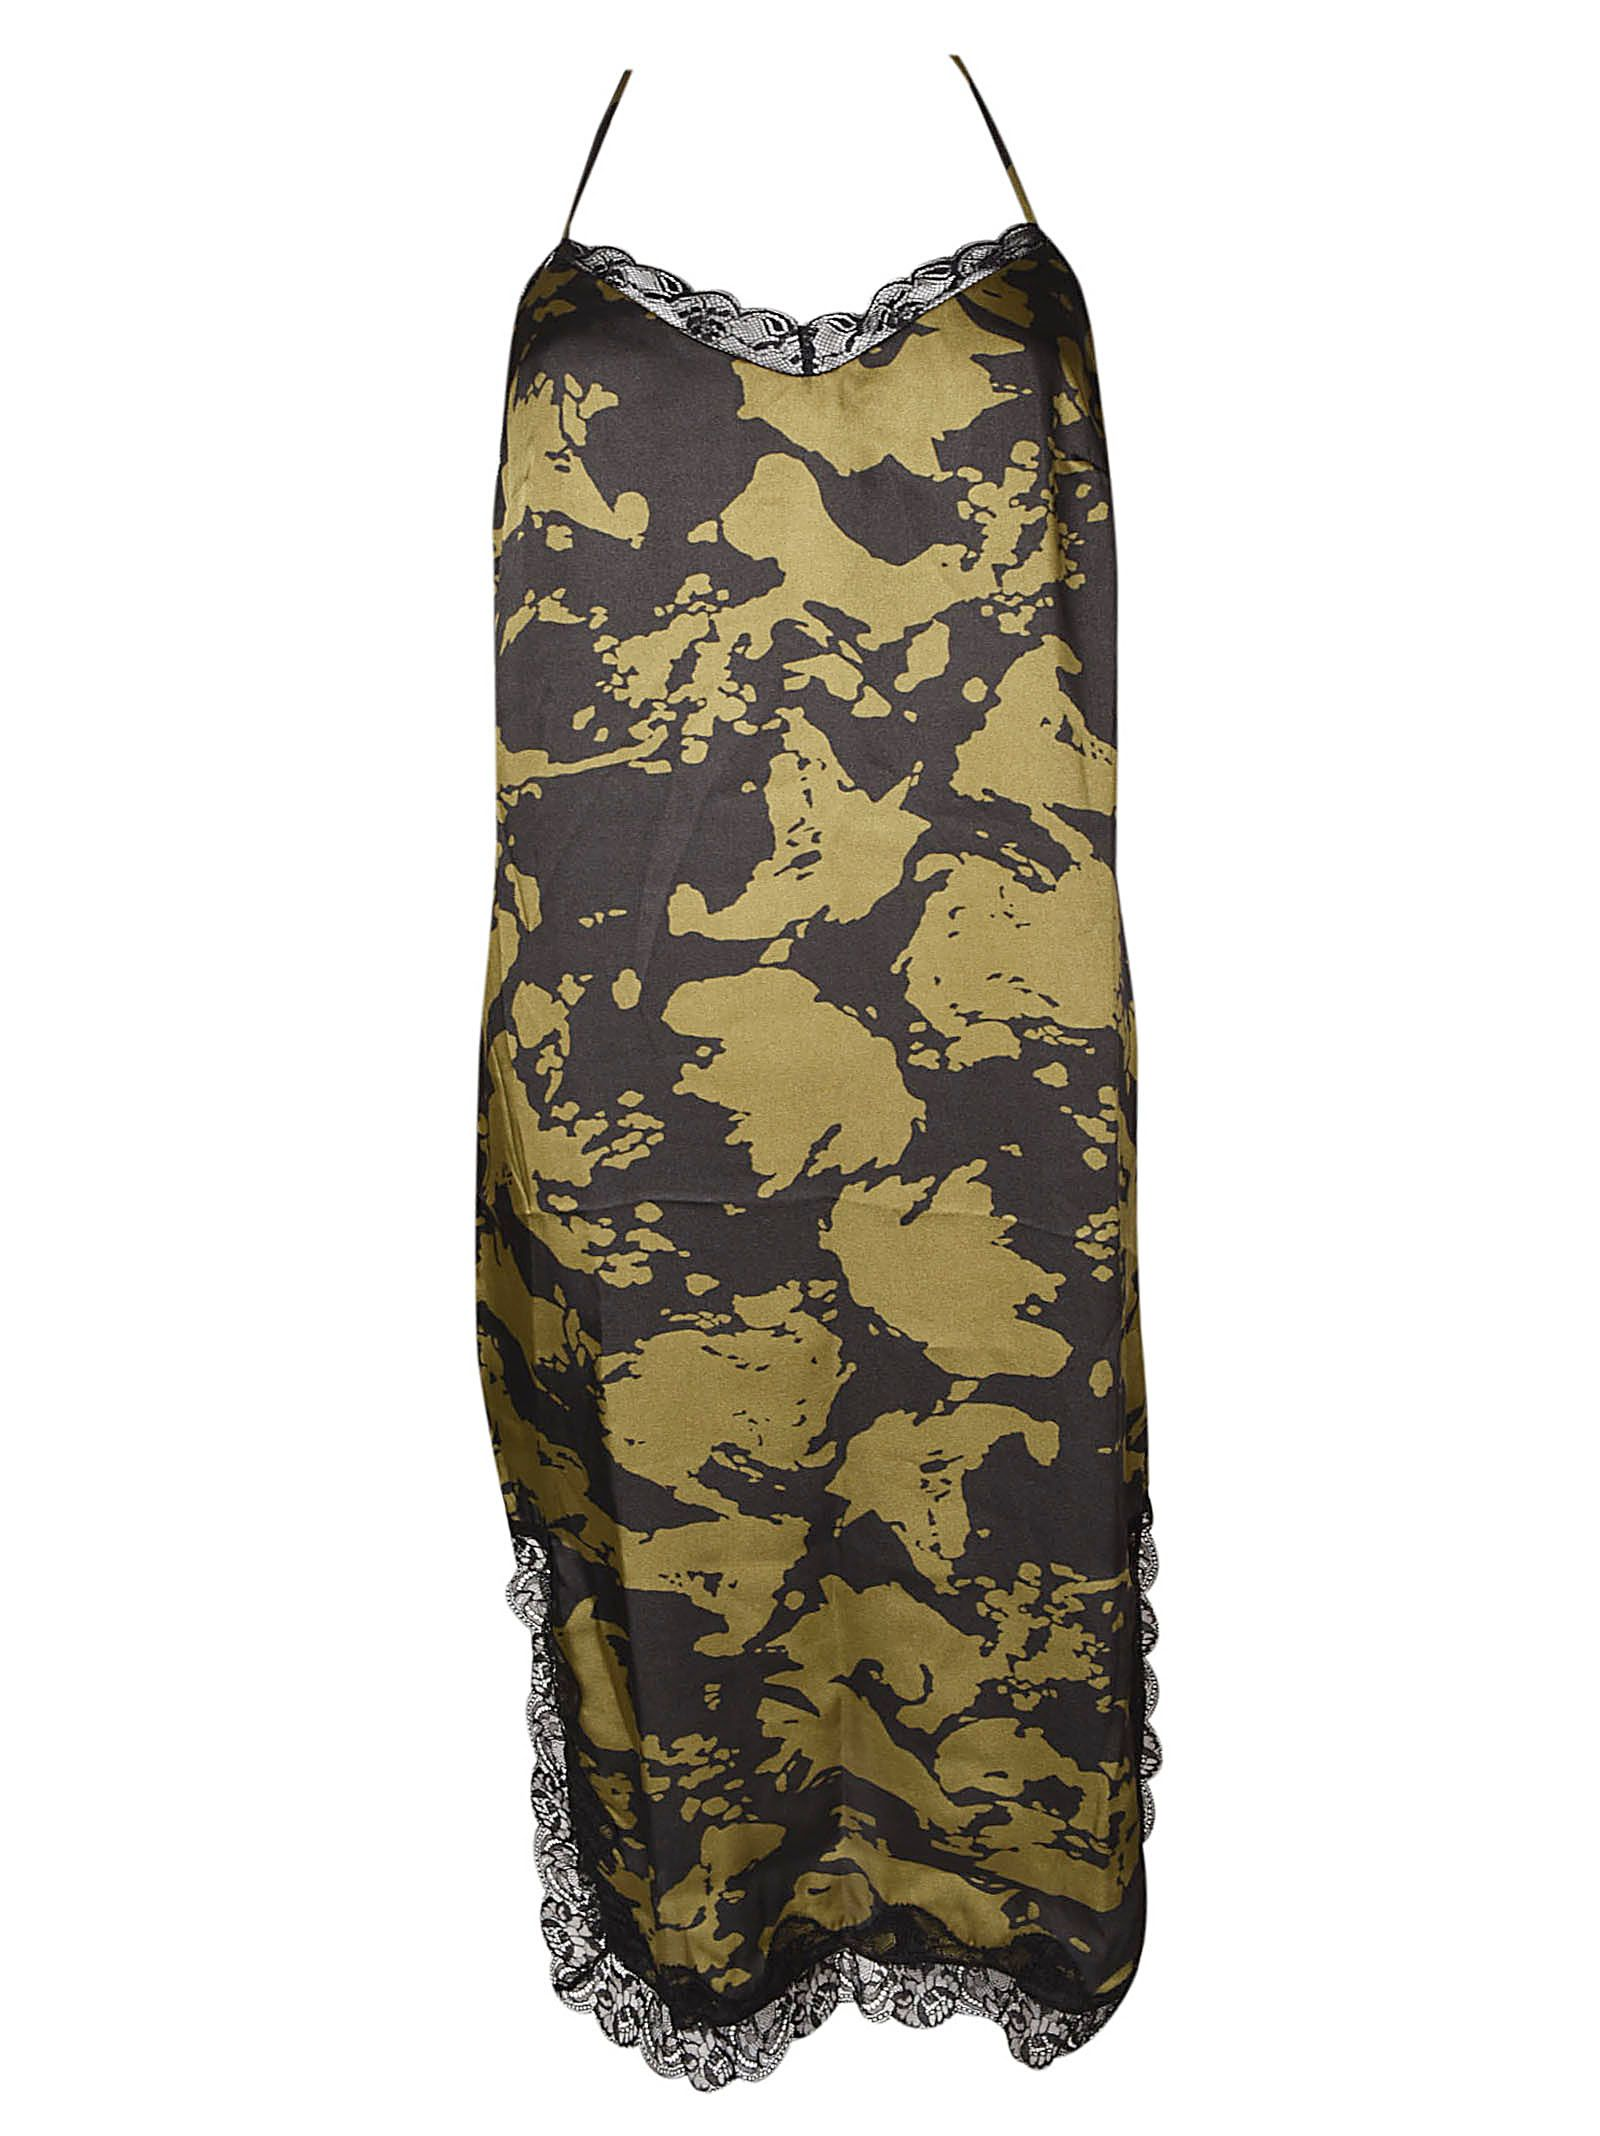 MASON'S Lace Detail Dress in Black/Green